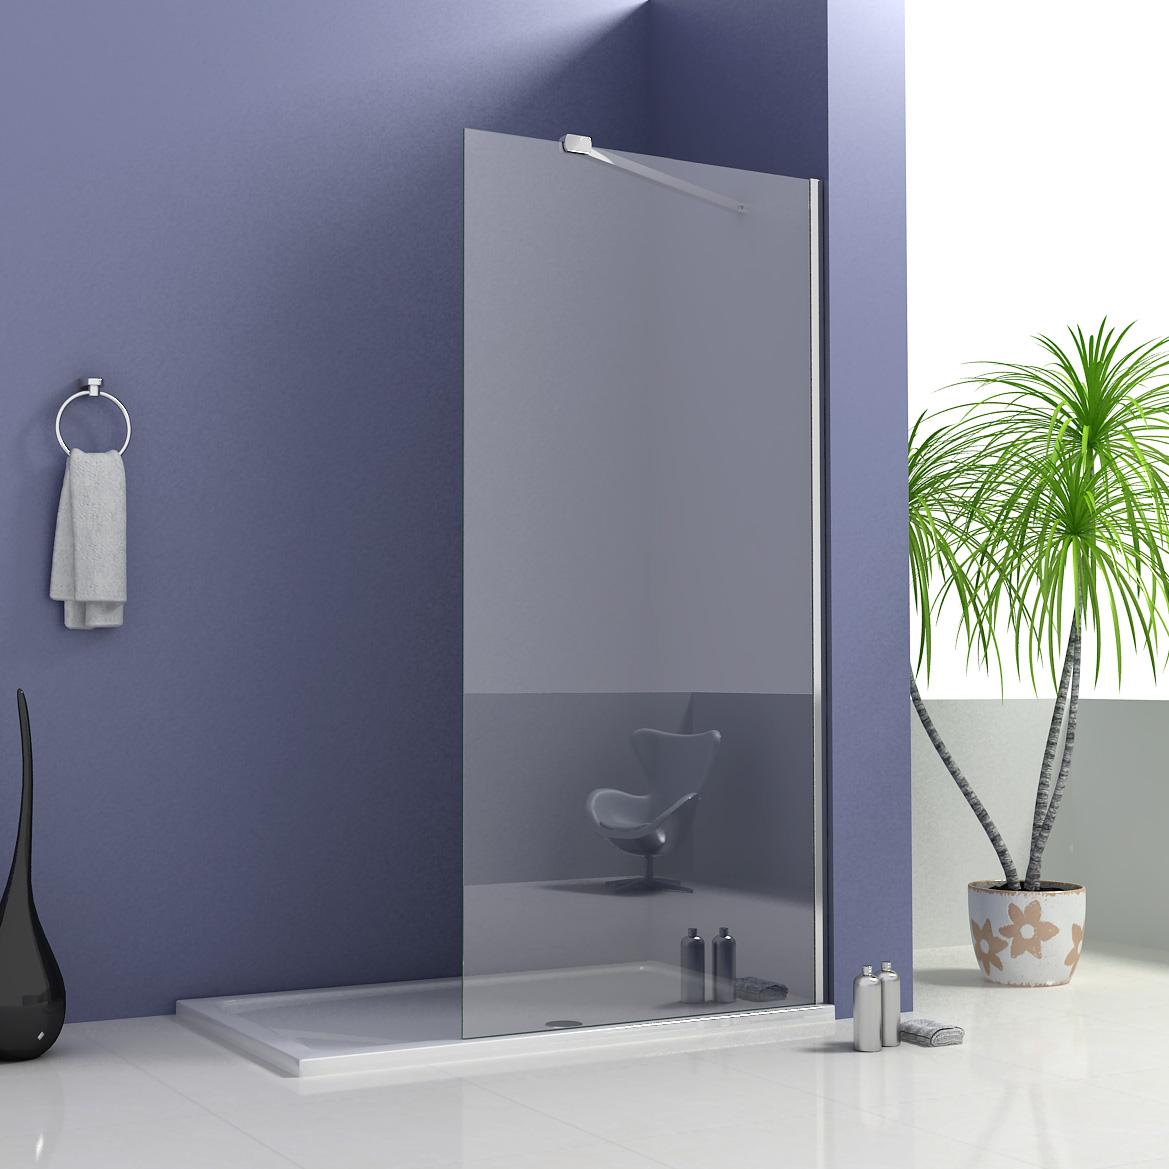 akdy shower panel installation manual